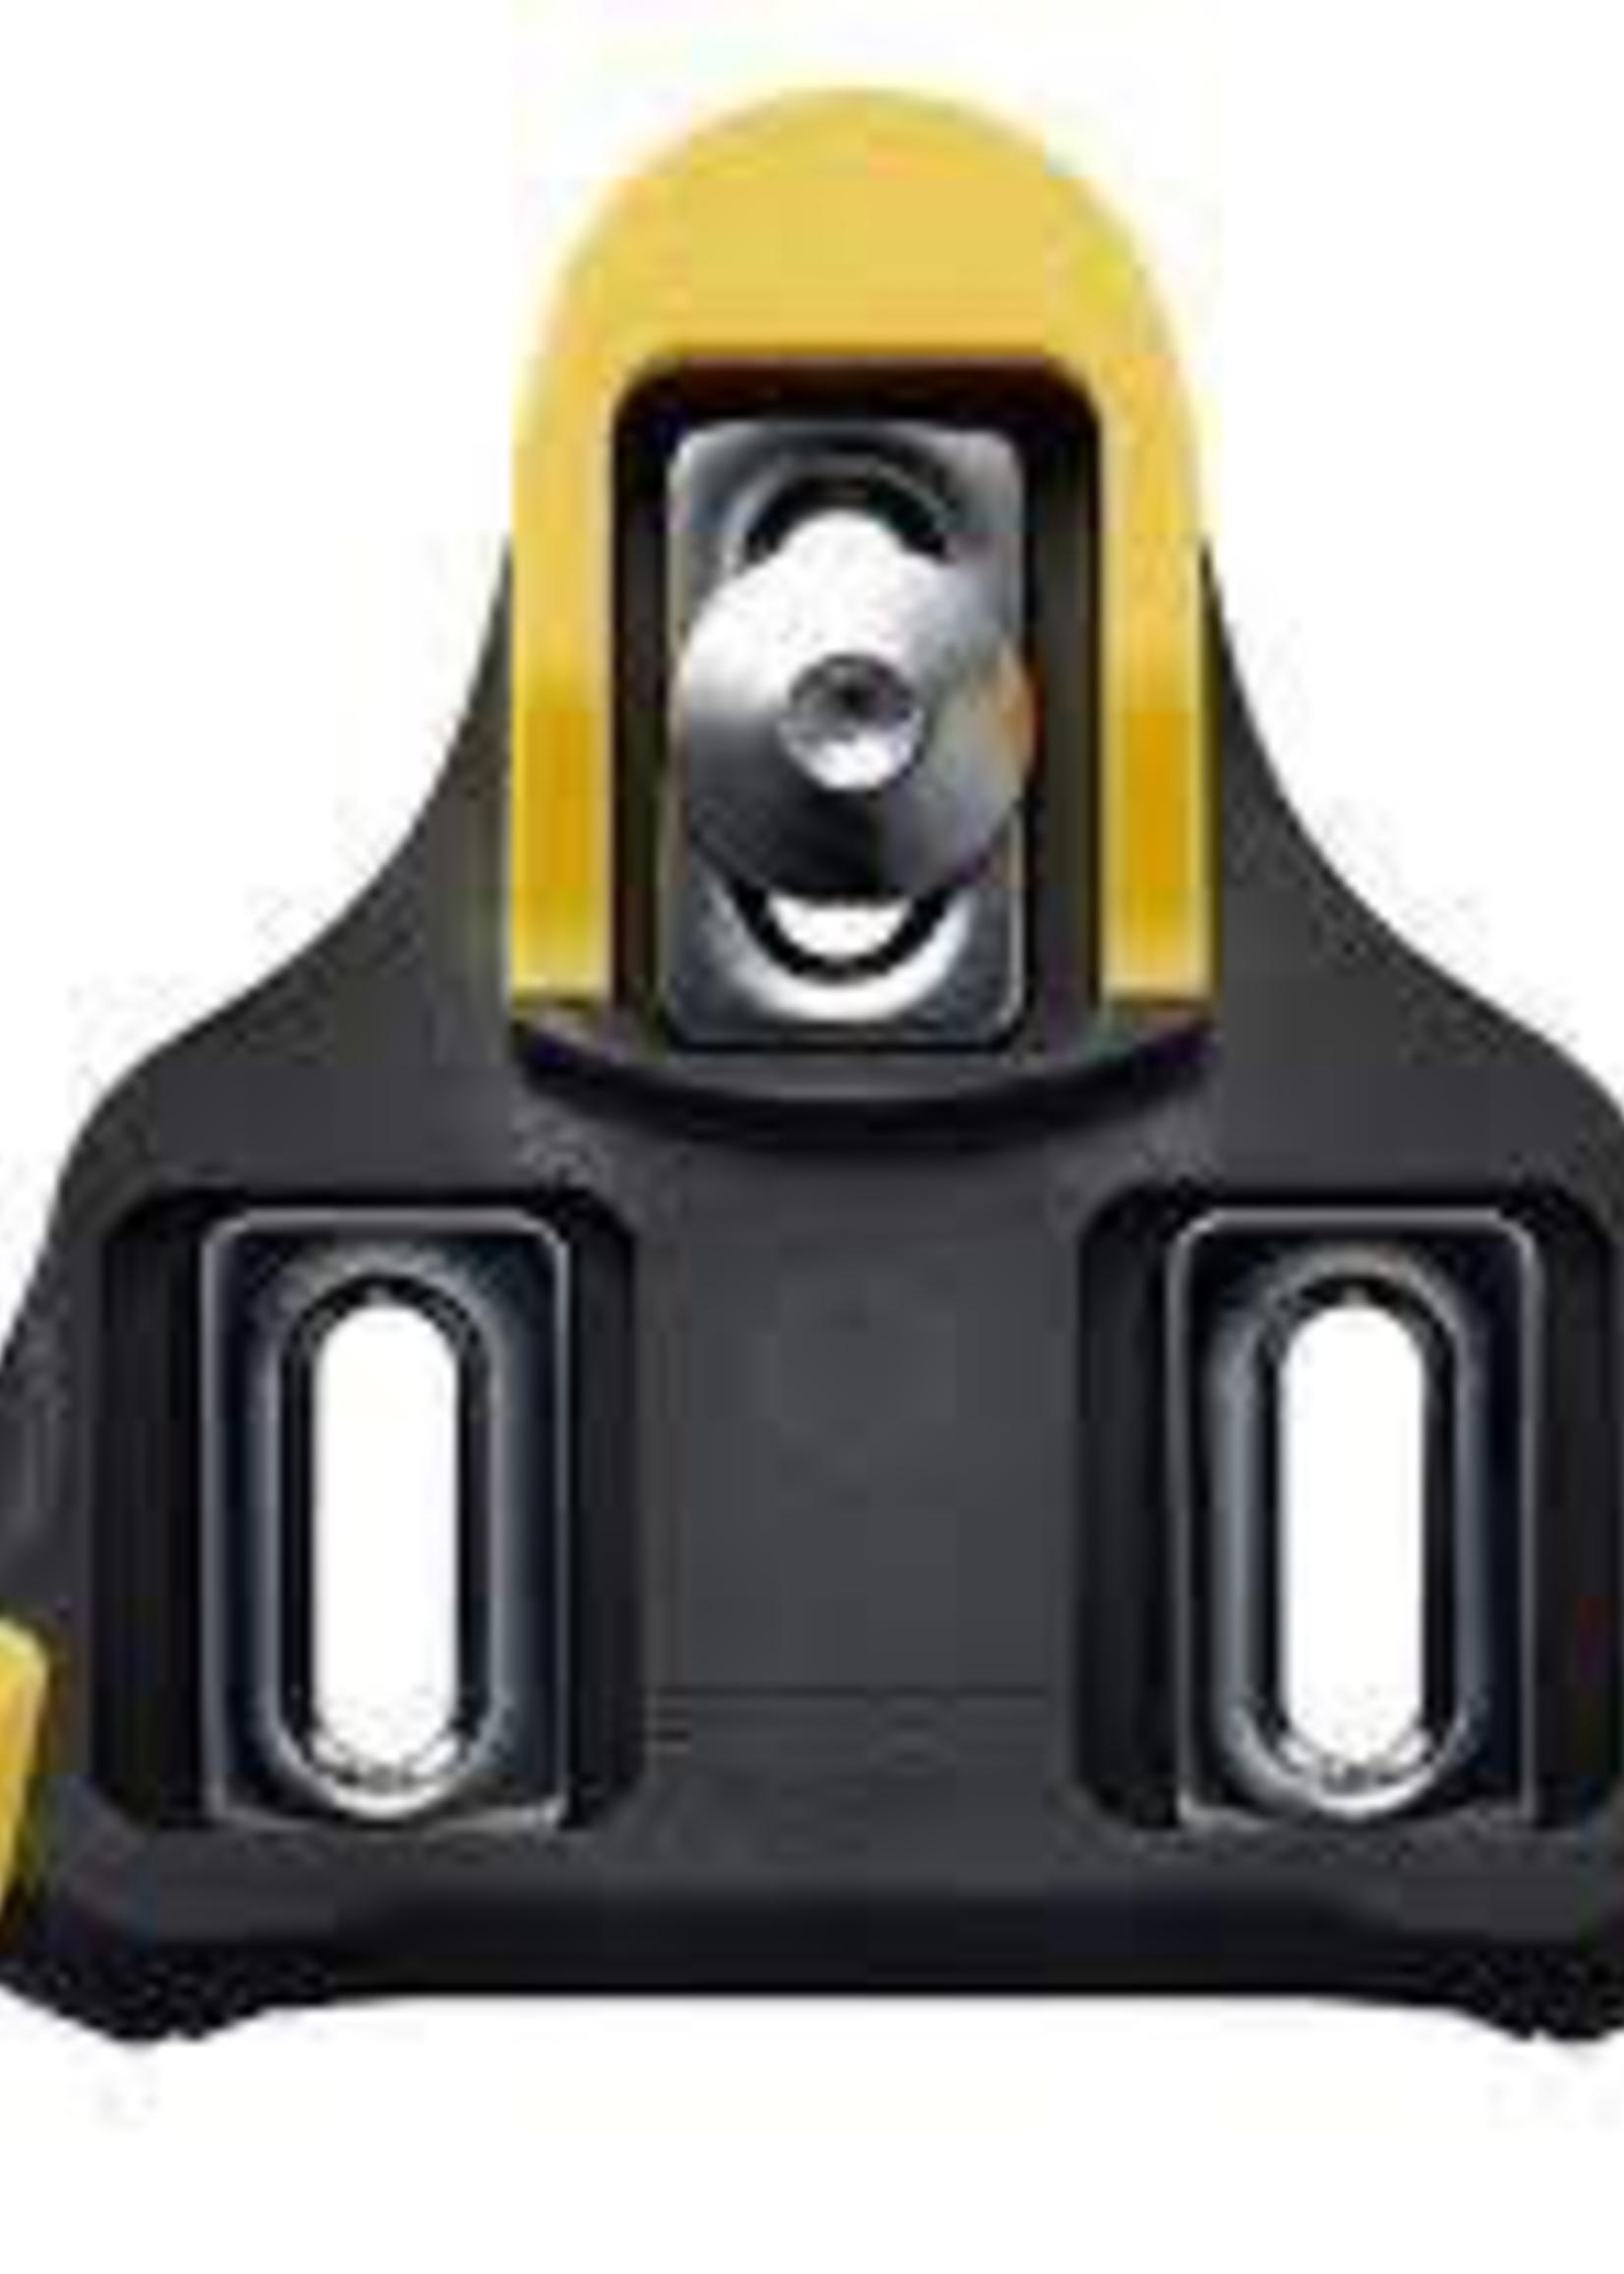 Shimano Shimano spd-sl road cleat set SM-SH11 yellow